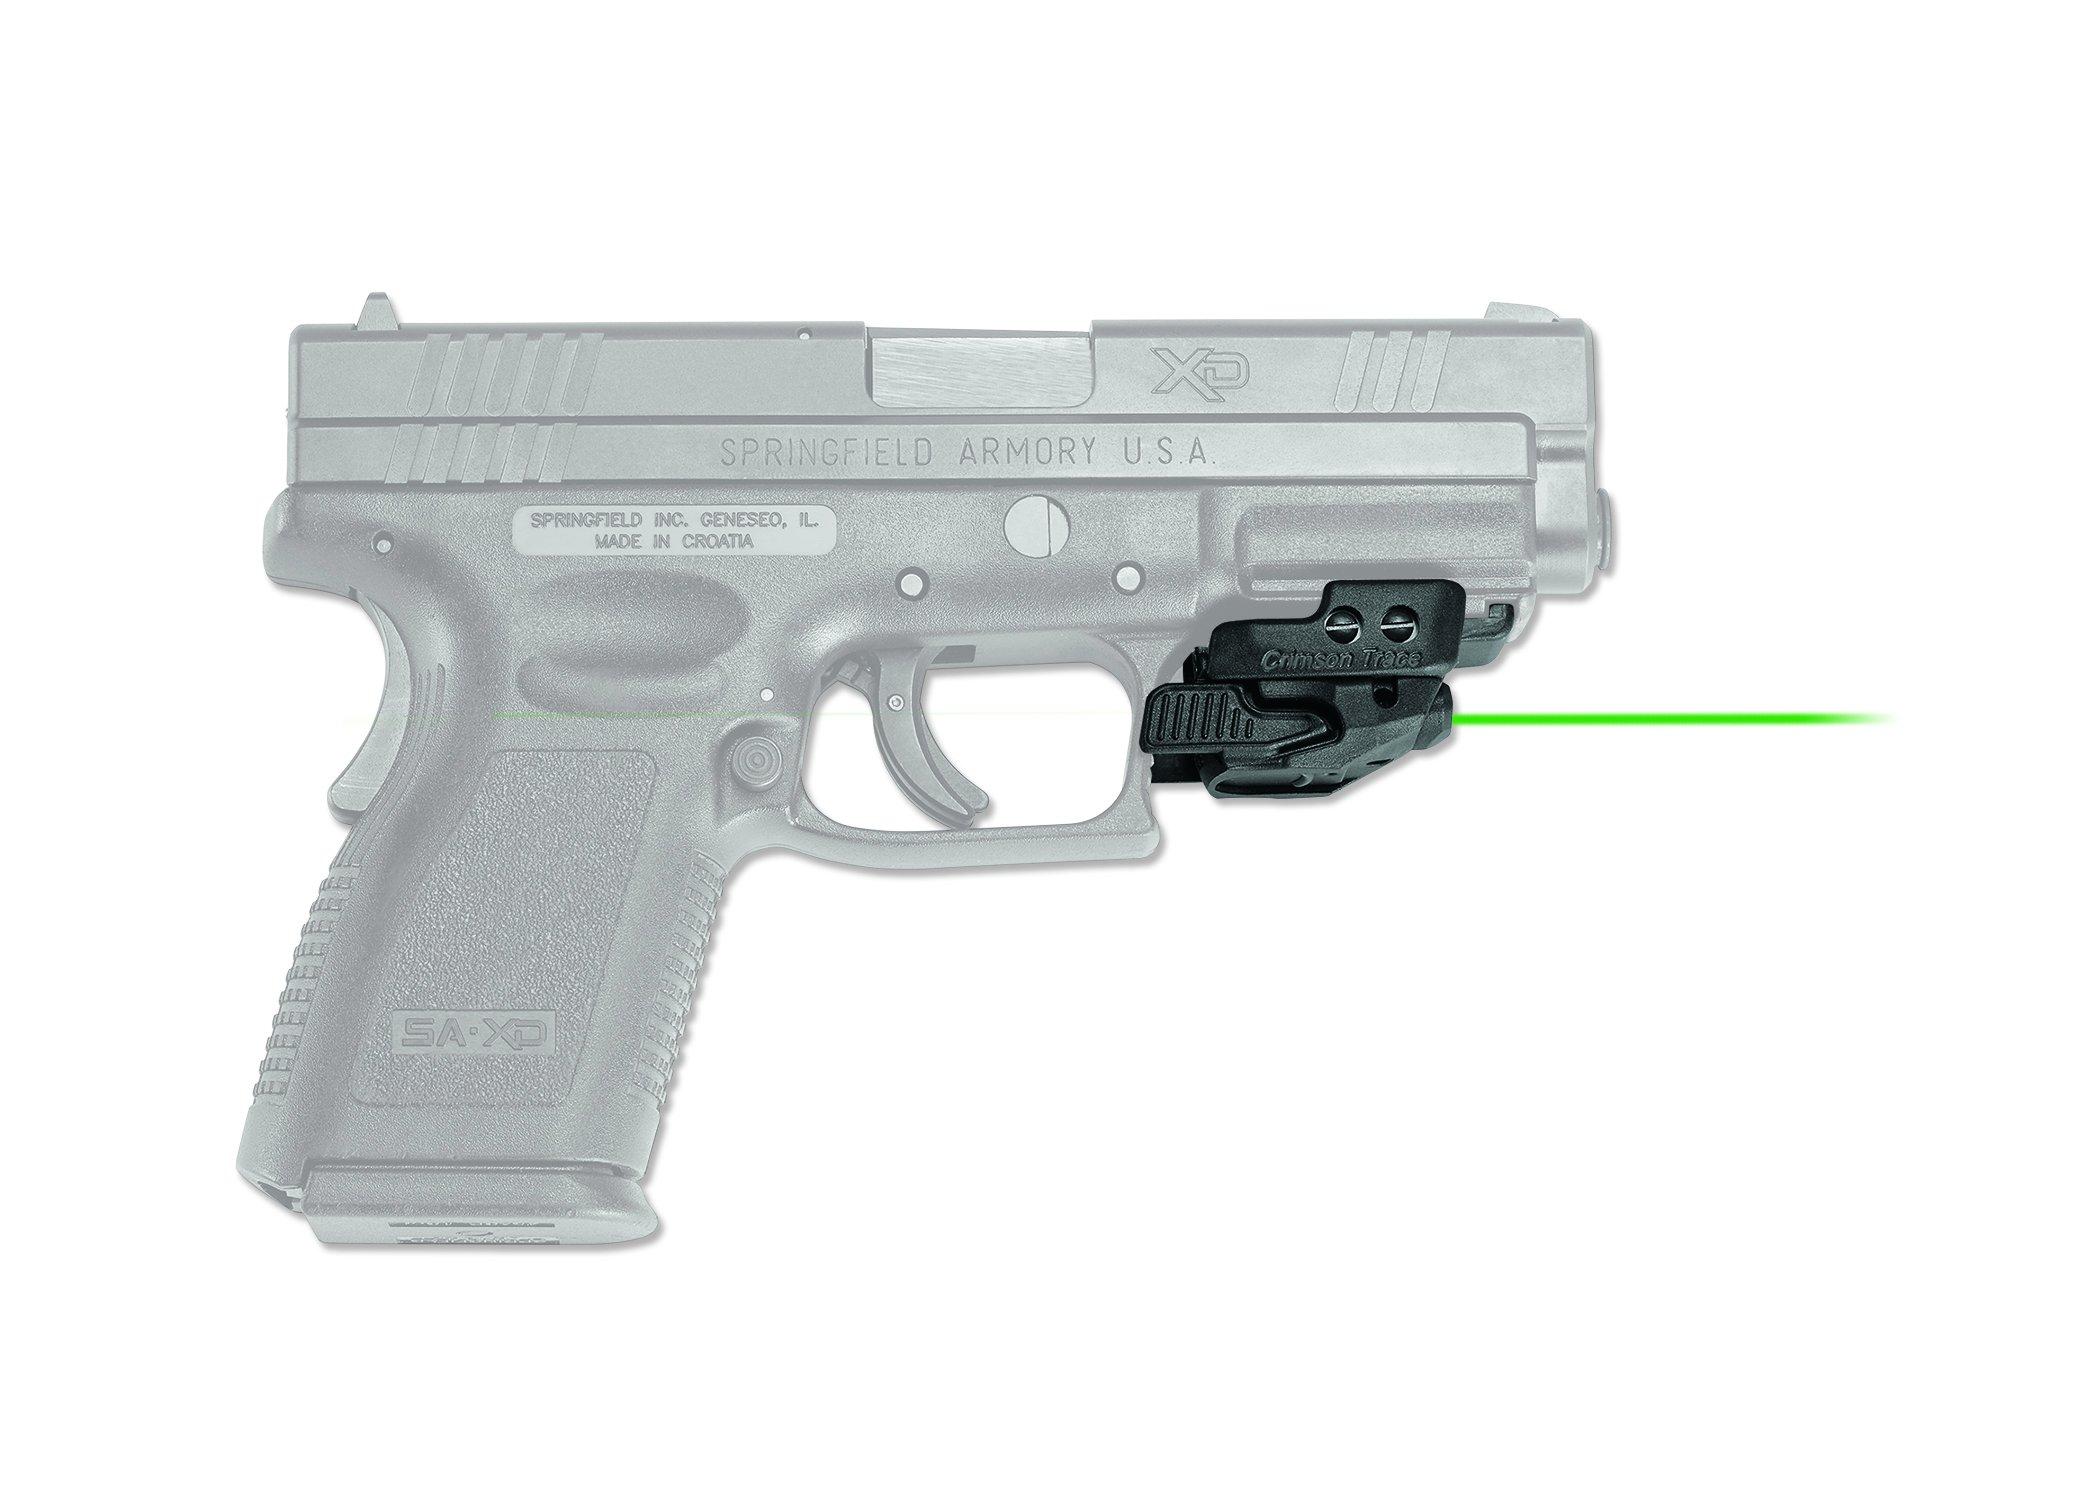 Crimson Trace CMR-206 Rail Master Universal Green Laser Sight by Crimson Trace (Image #1)